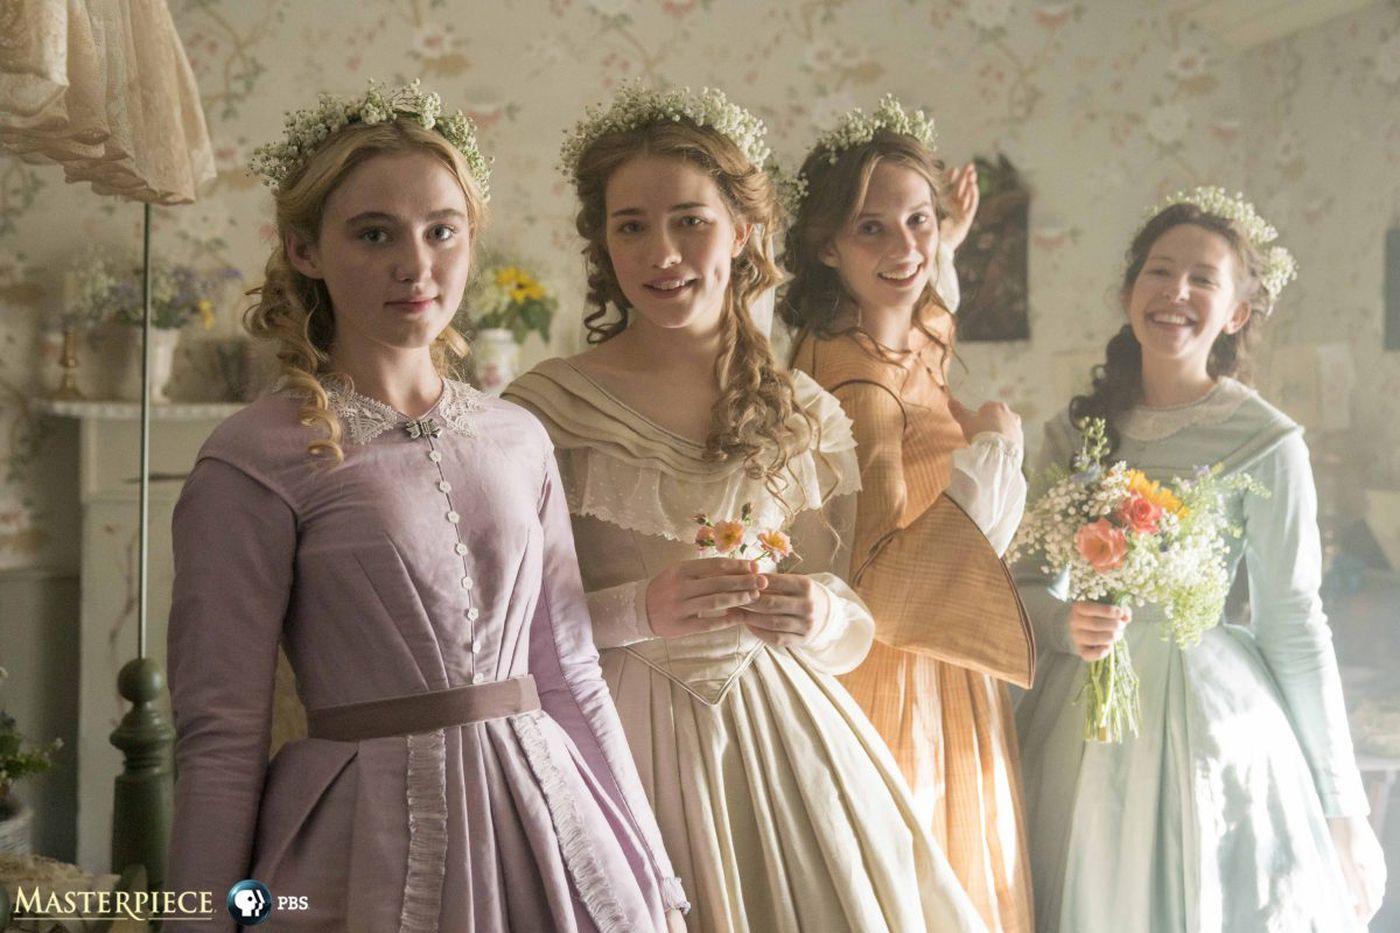 TV picks: 'Little Women,' 'Harry & Meghan,' 'The Goldbergs' and more